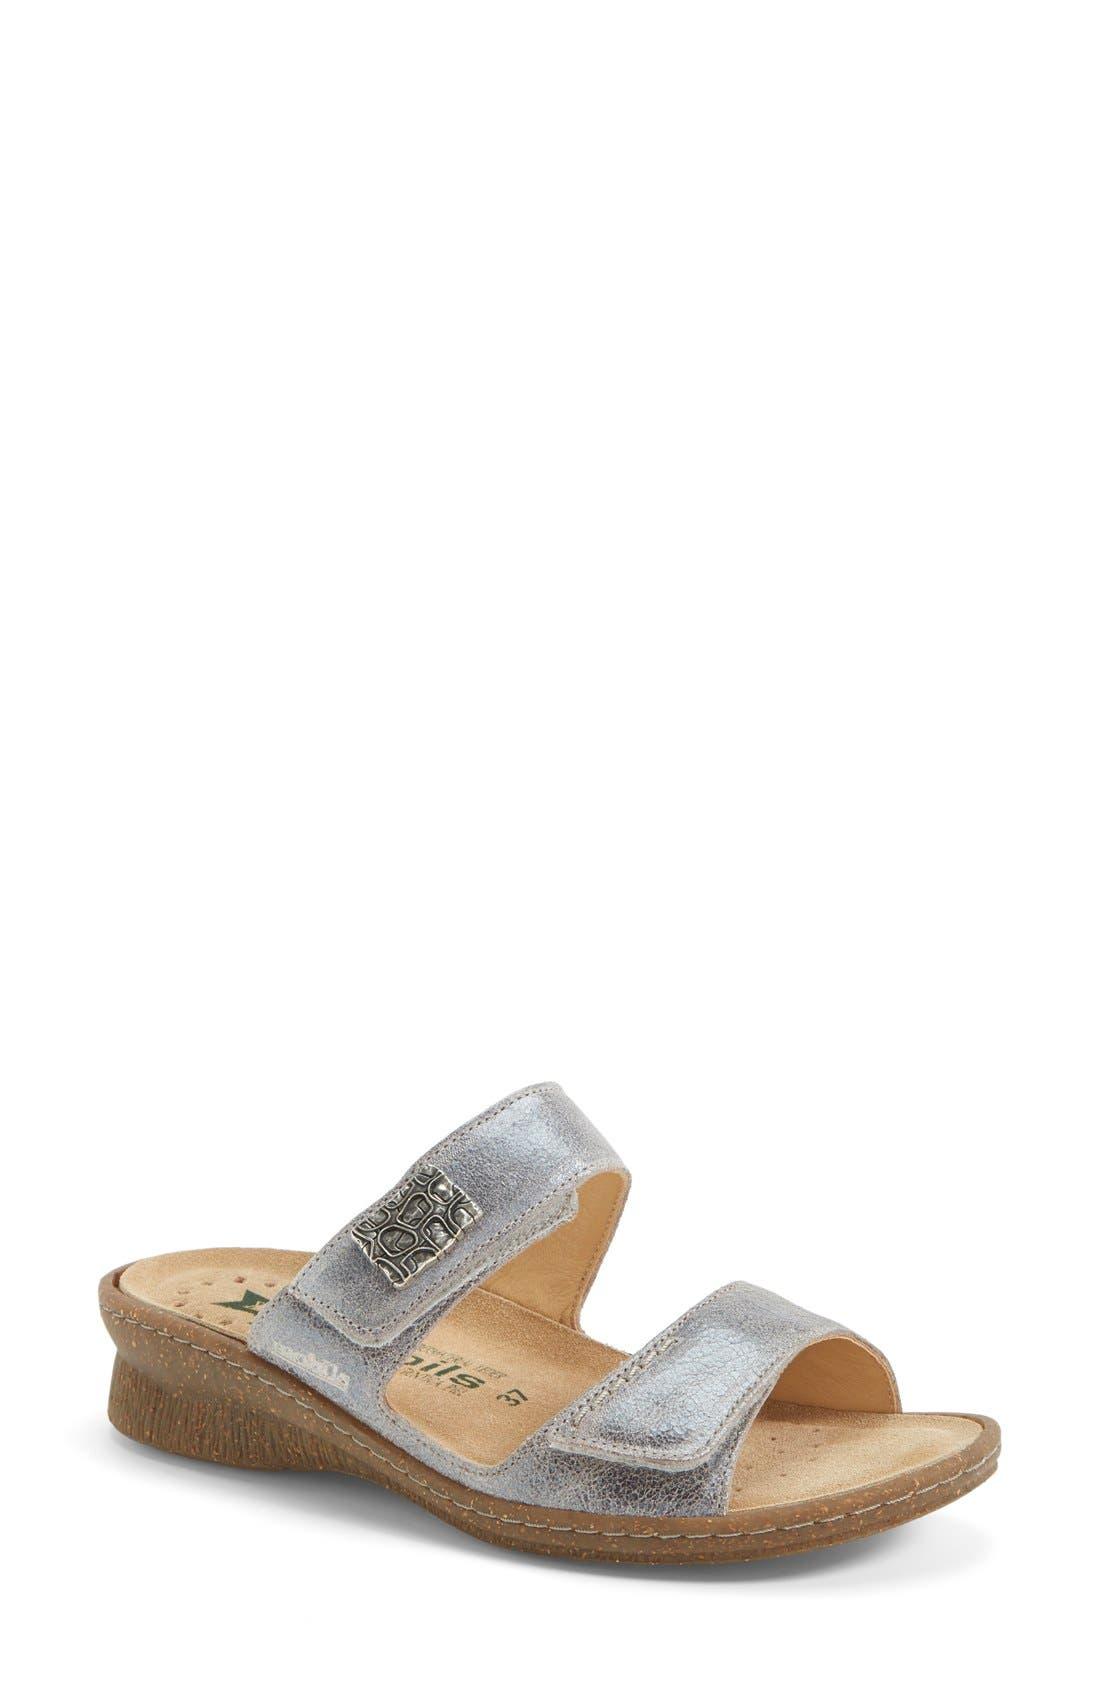 Main Image - Mephisto 'Bregalia' Metallic Leather Sandal (Women)